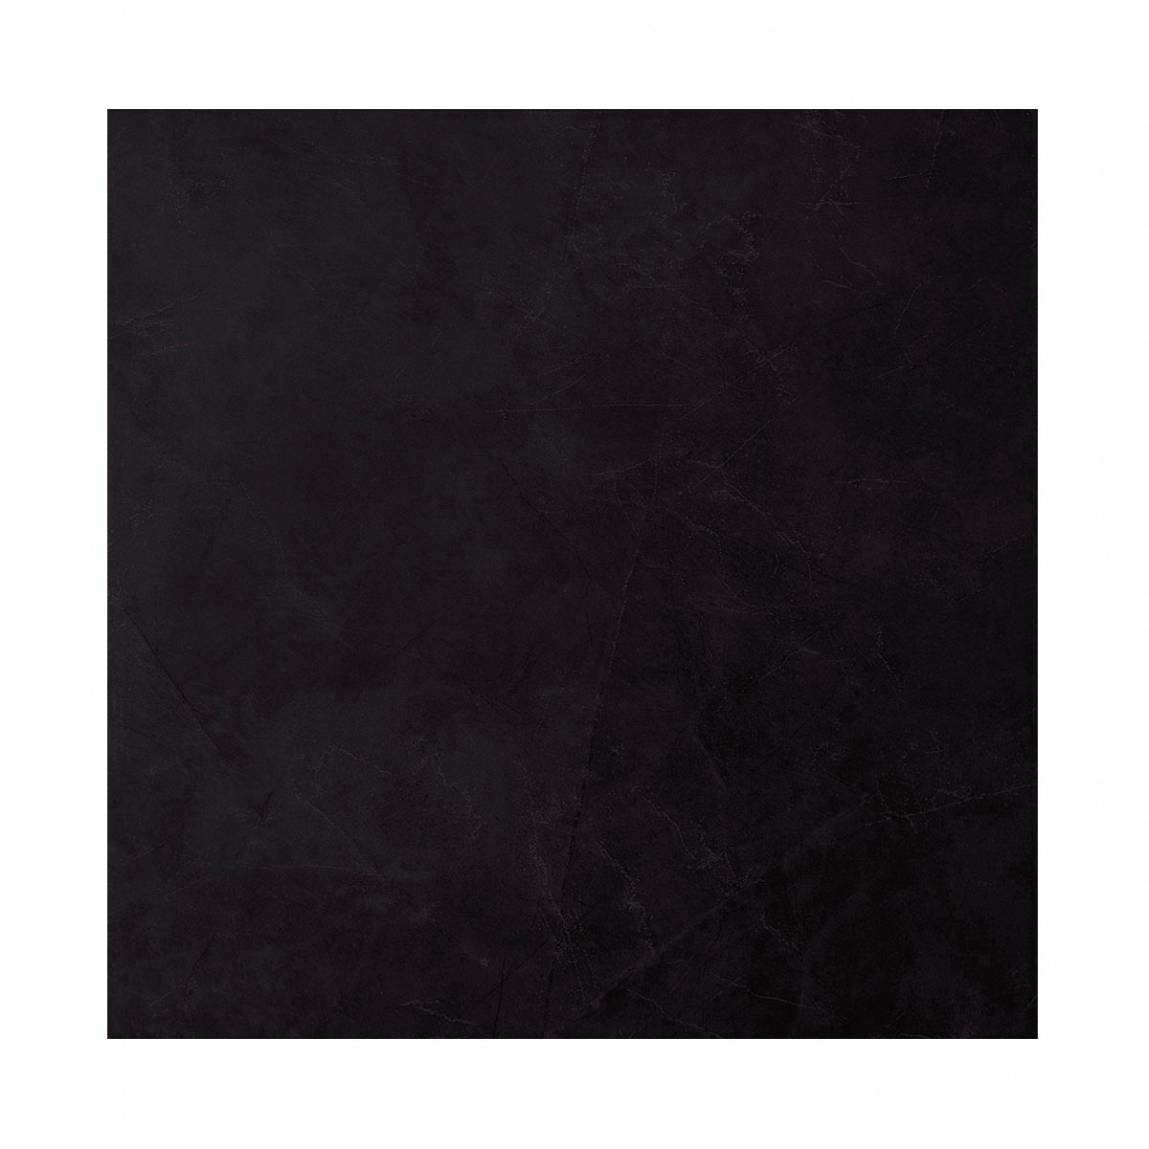 Black sparkle floor tiles 2017 2018 best cars reviews Black and white ceramic tile